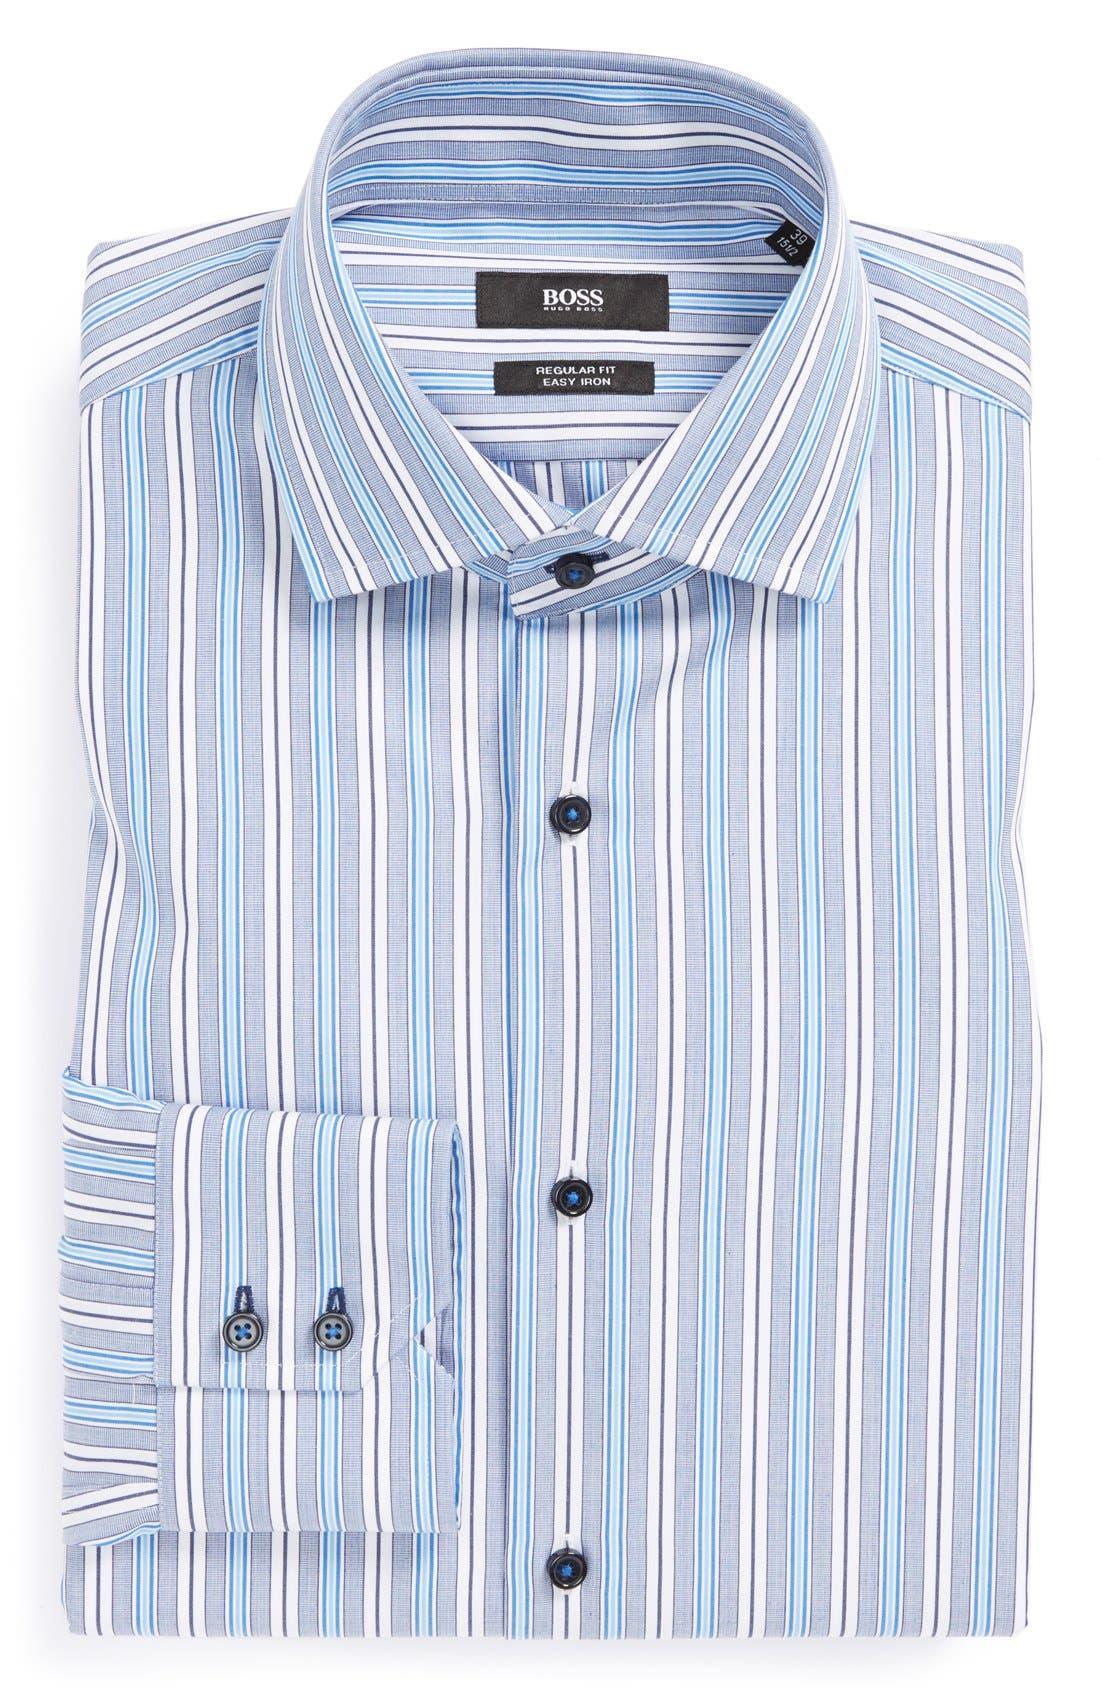 Alternate Image 1 Selected - BOSS HUGO BOSS 'Gorman' WW Regular Fit Easy Iron Stripe Dress Shirt